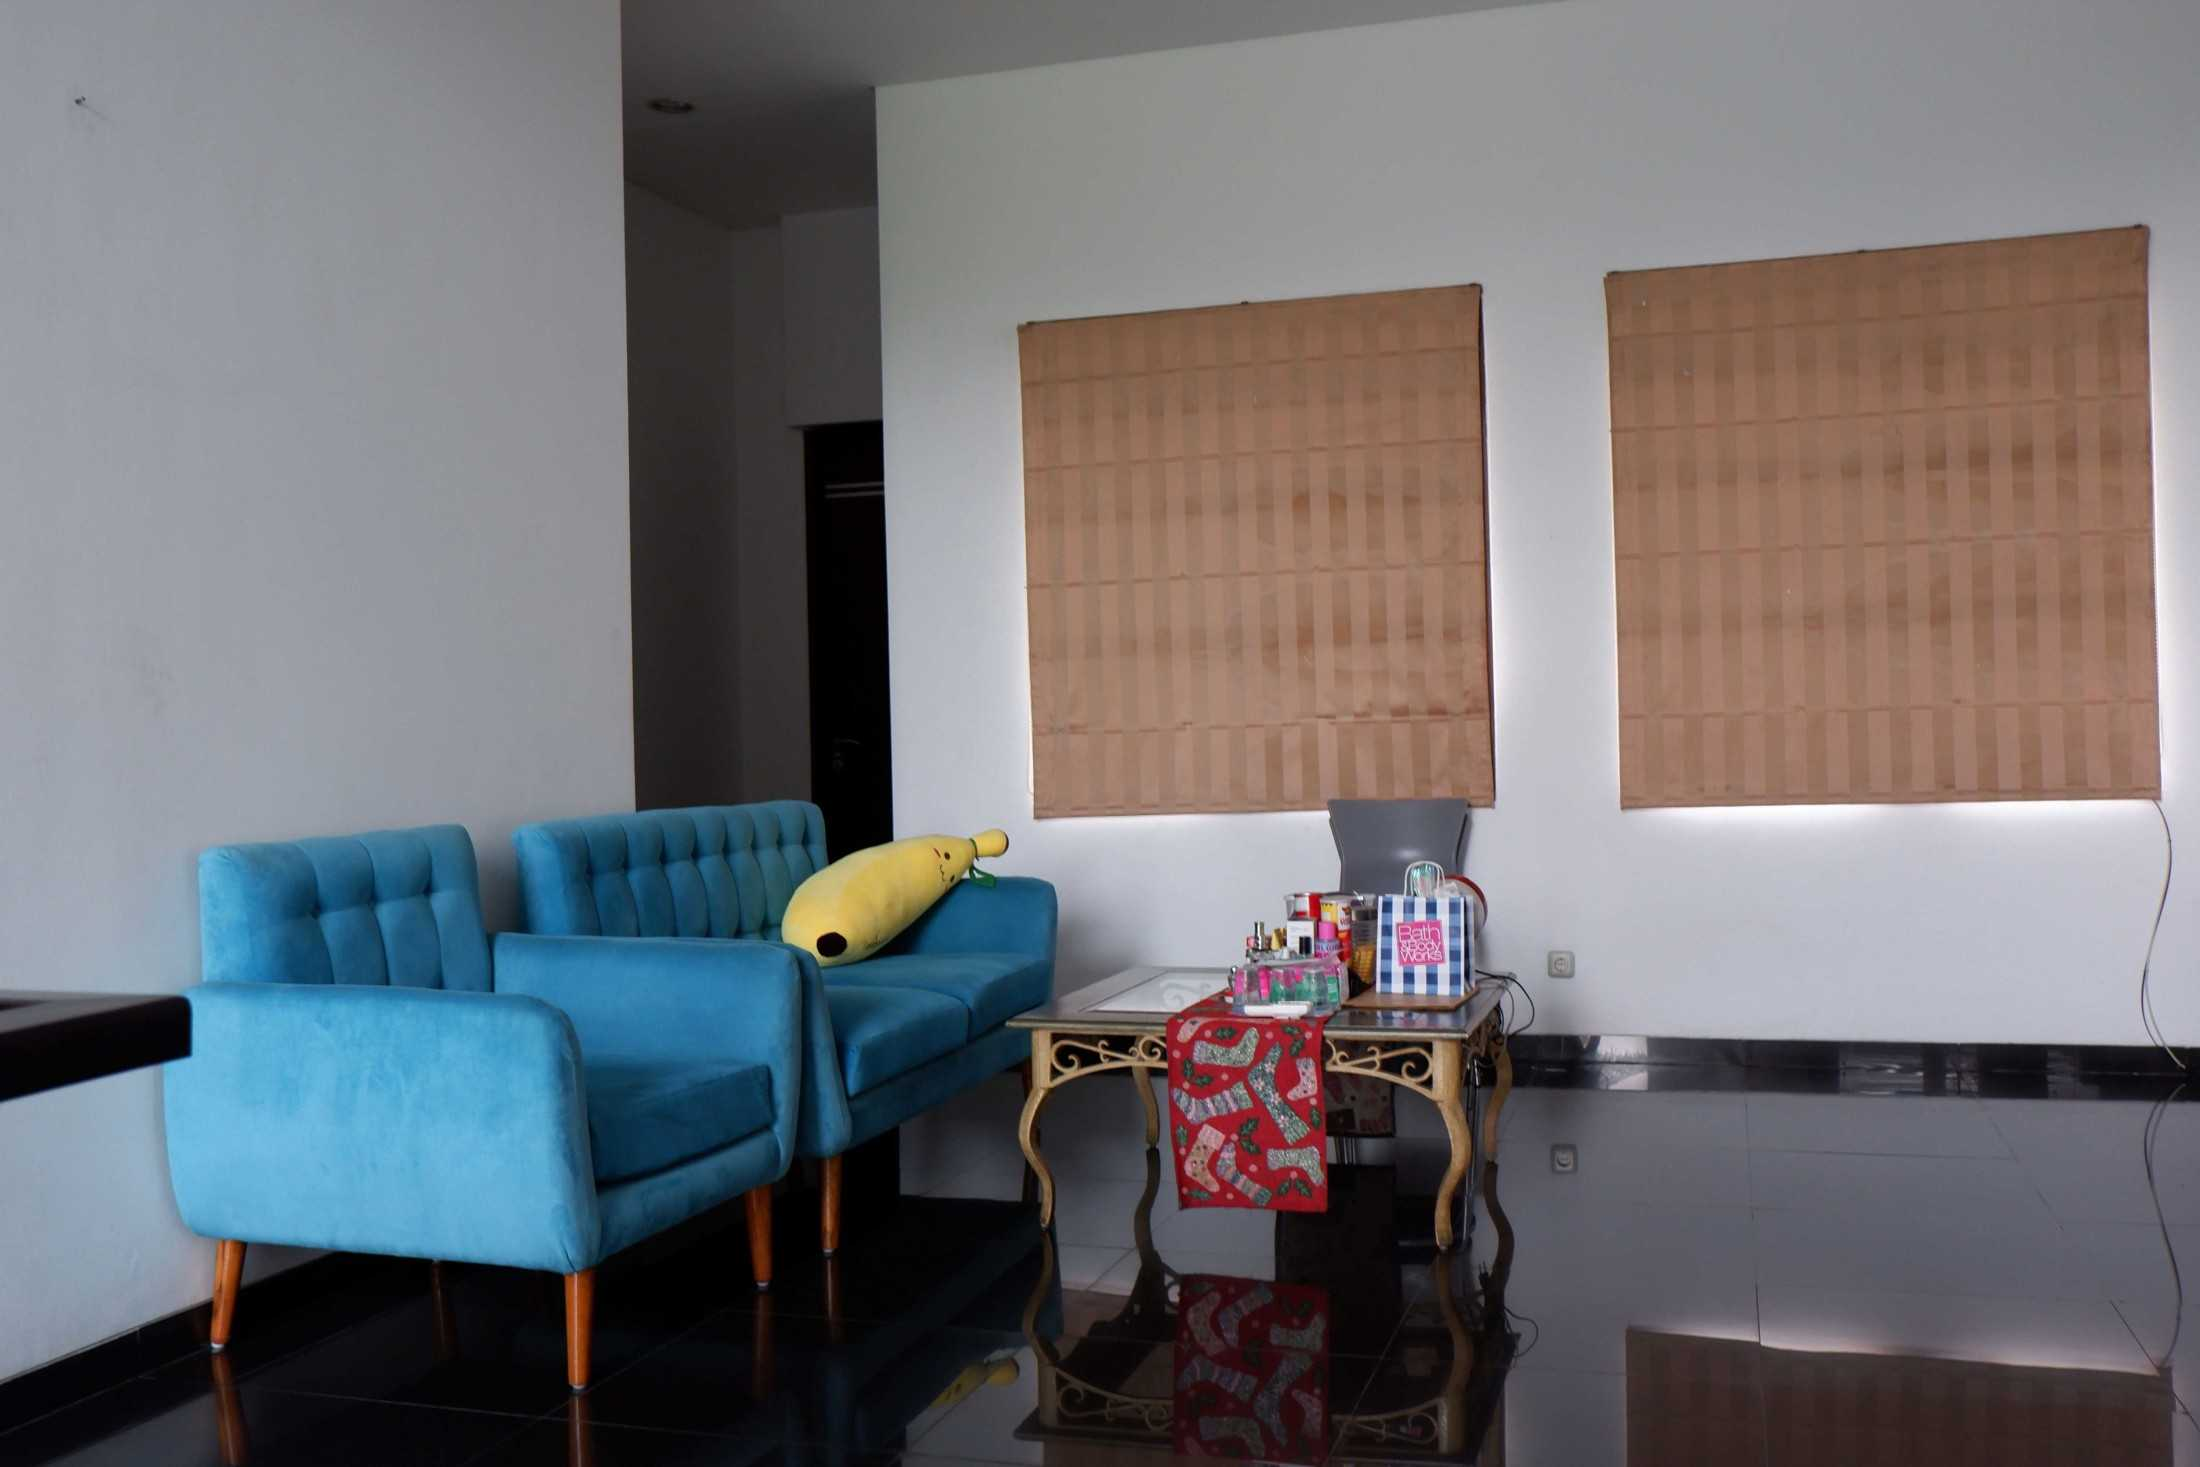 Lokative Studio Renovasi Rumah Cempaka Jakarta, Daerah Khusus Ibukota Jakarta, Indonesia Jakarta, Daerah Khusus Ibukota Jakarta, Indonesia Lokative-Studio-Renovasi-Rumah-Cempaka  97463